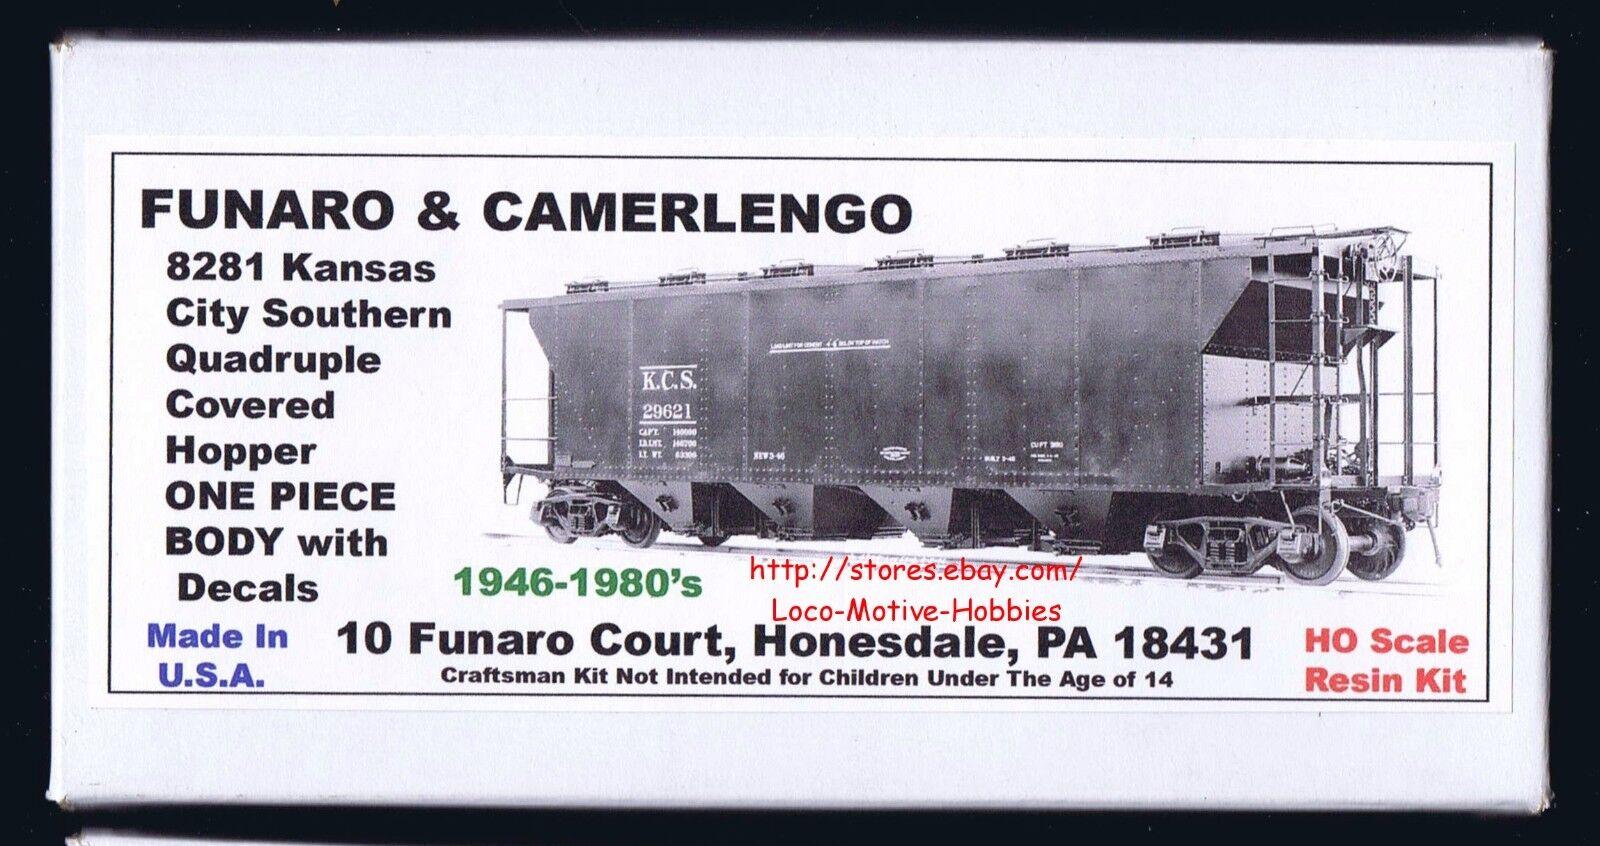 LMH Funaro F&C 8281  KANSAS CITY SOUTHERN  Quadruple KCS Covered Hopper  1 PIECE